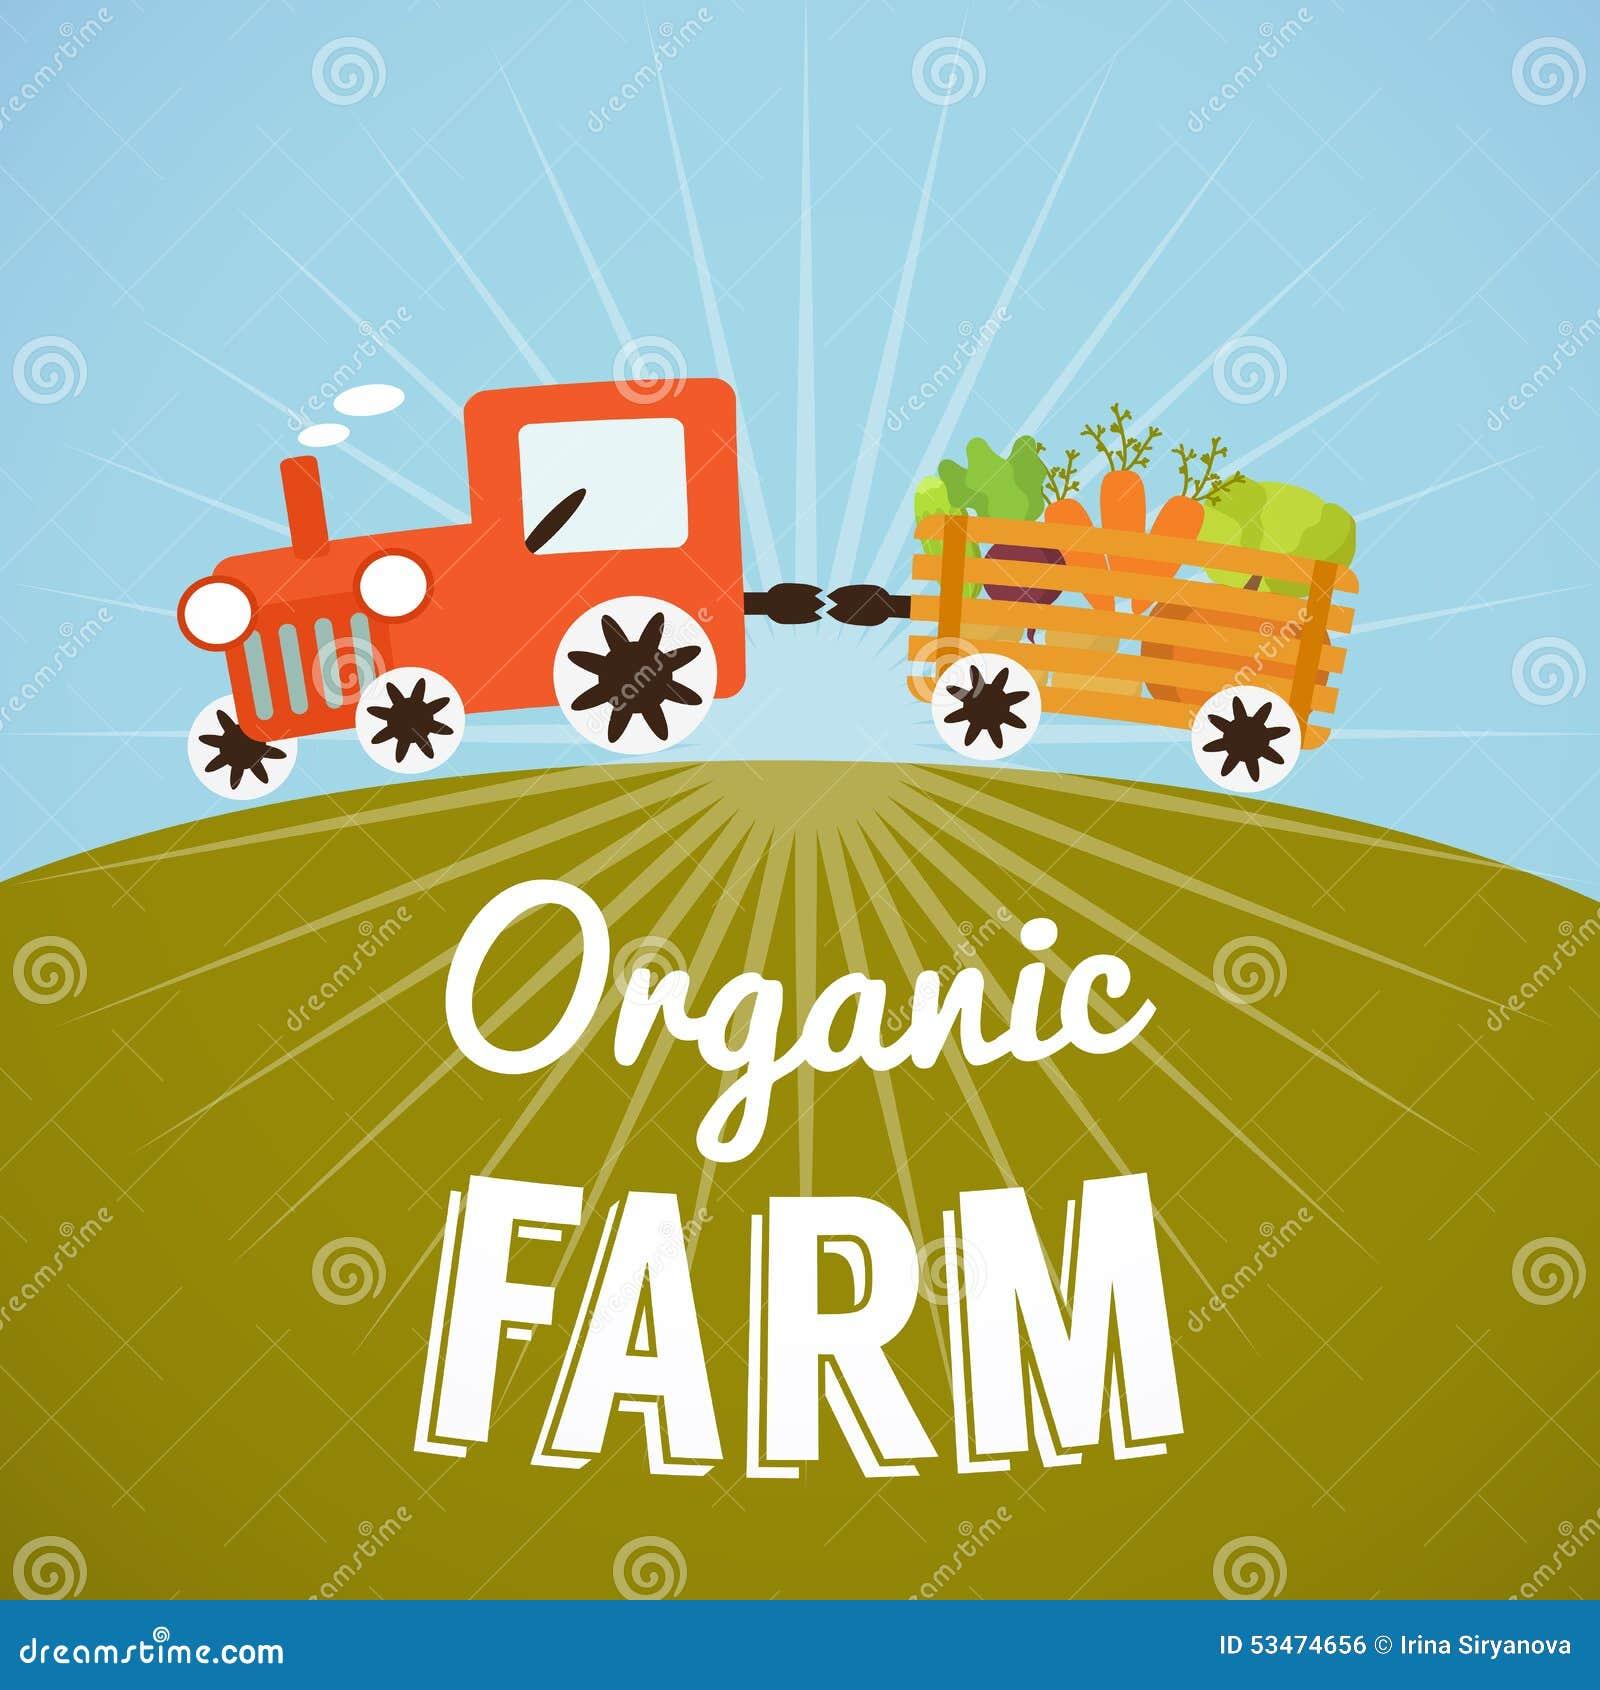 Organic Farm Poster Stock Vector - Image: 53474656